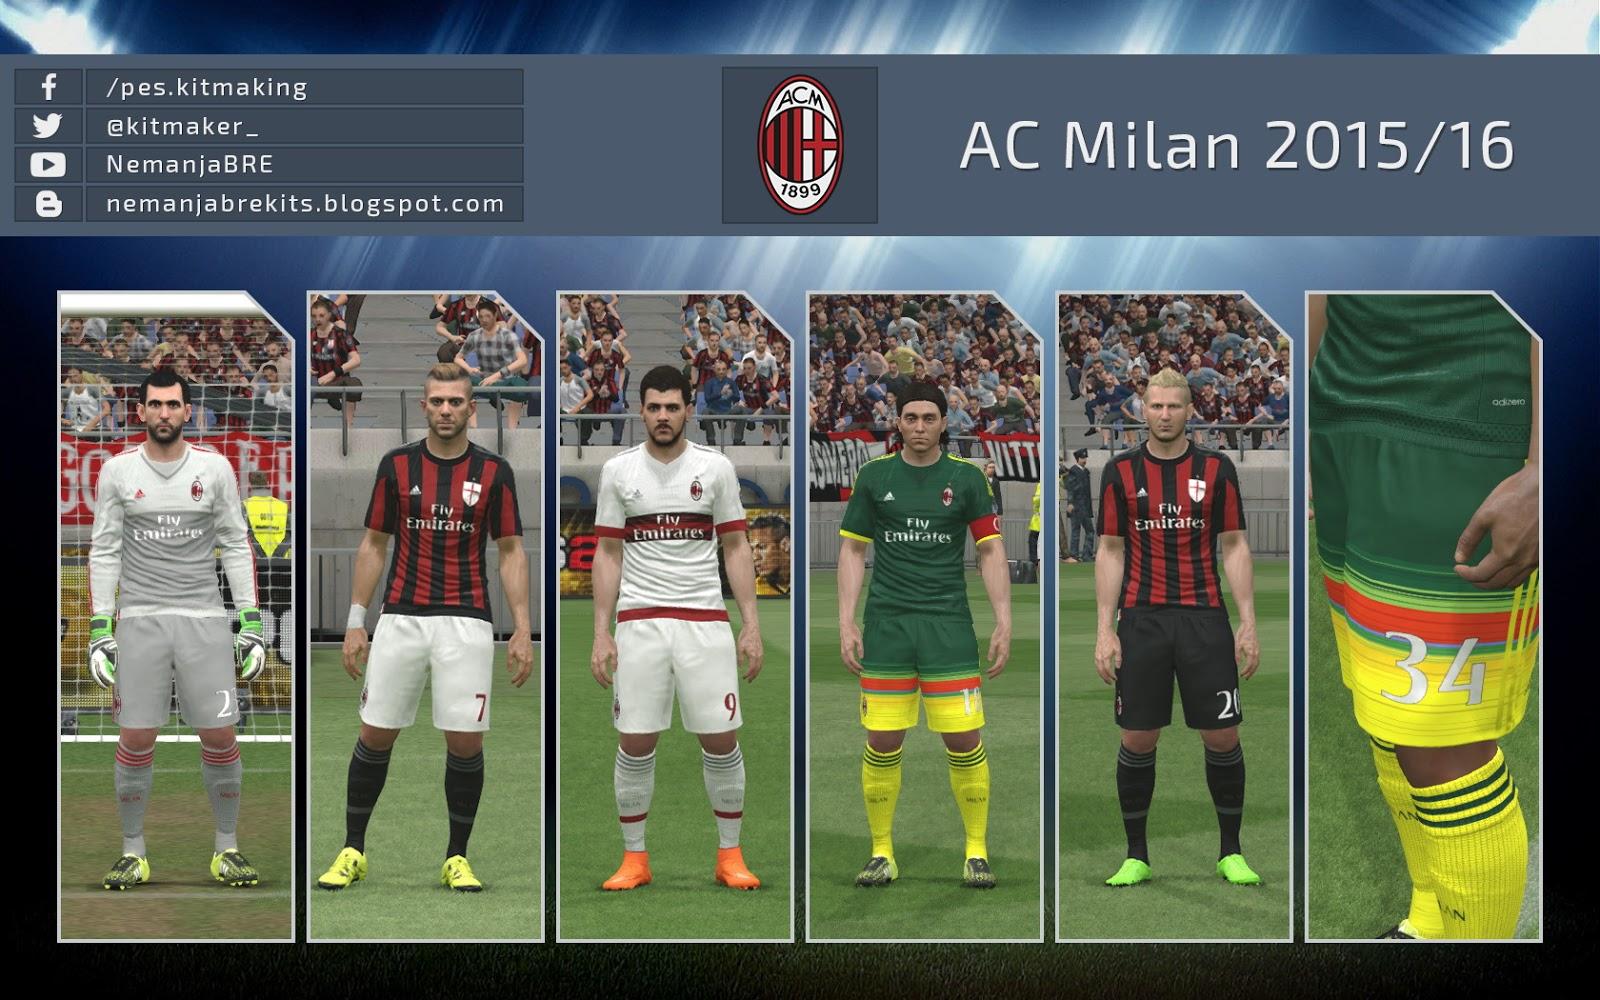 Pes-modif: PES 2016 AC Milan 2015/16 GDB By Nemanja